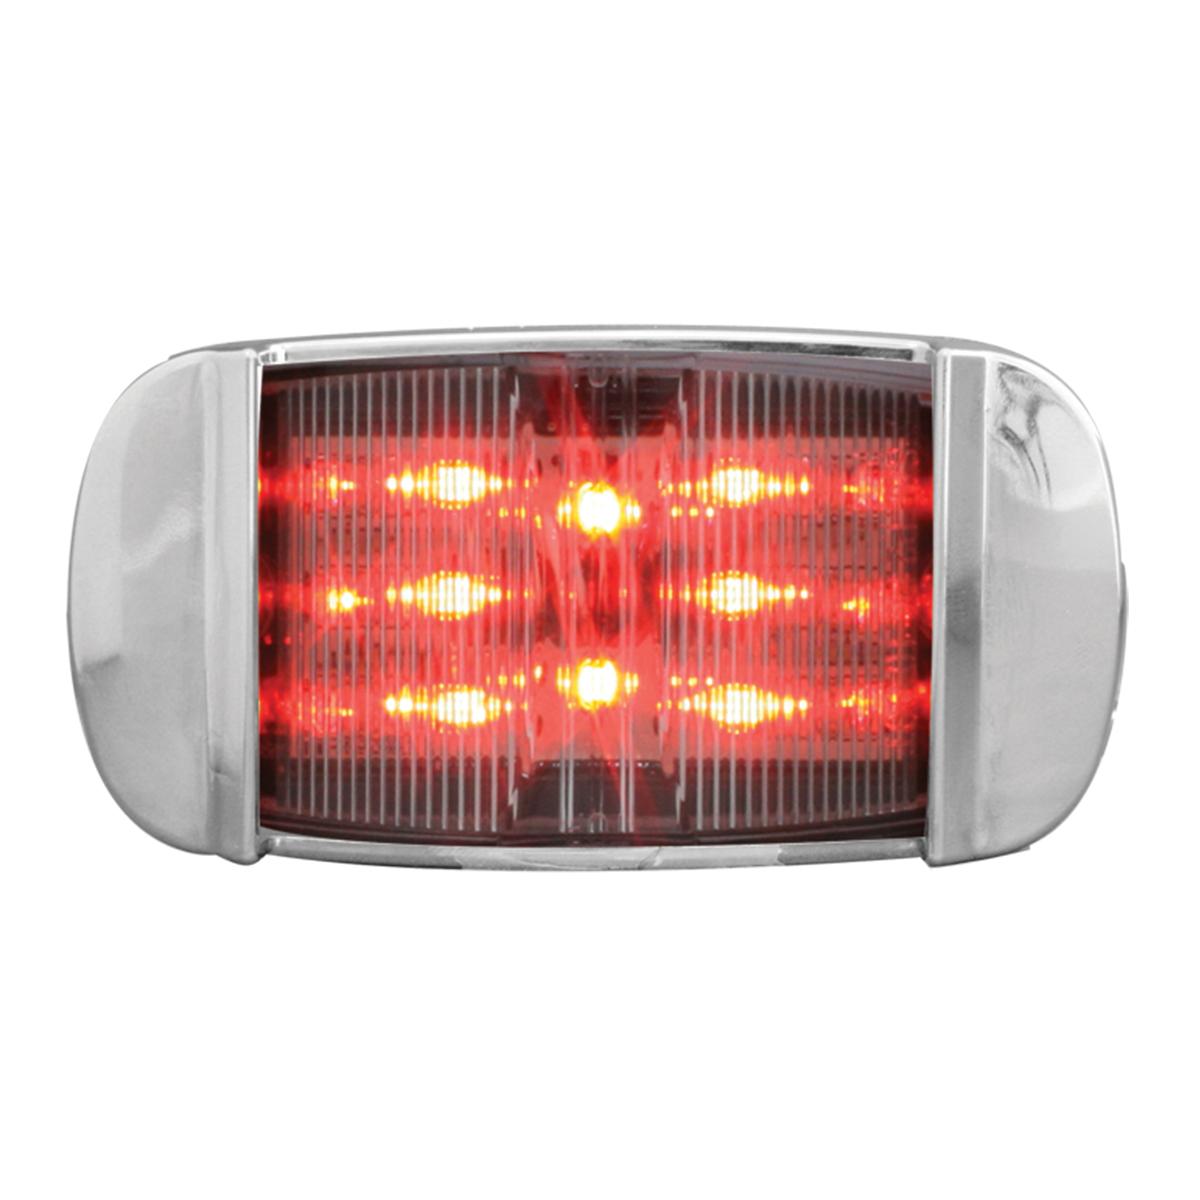 76257 Rectangular Camel Back Wide Angle LED Marker Light w/ Chrome Bezel